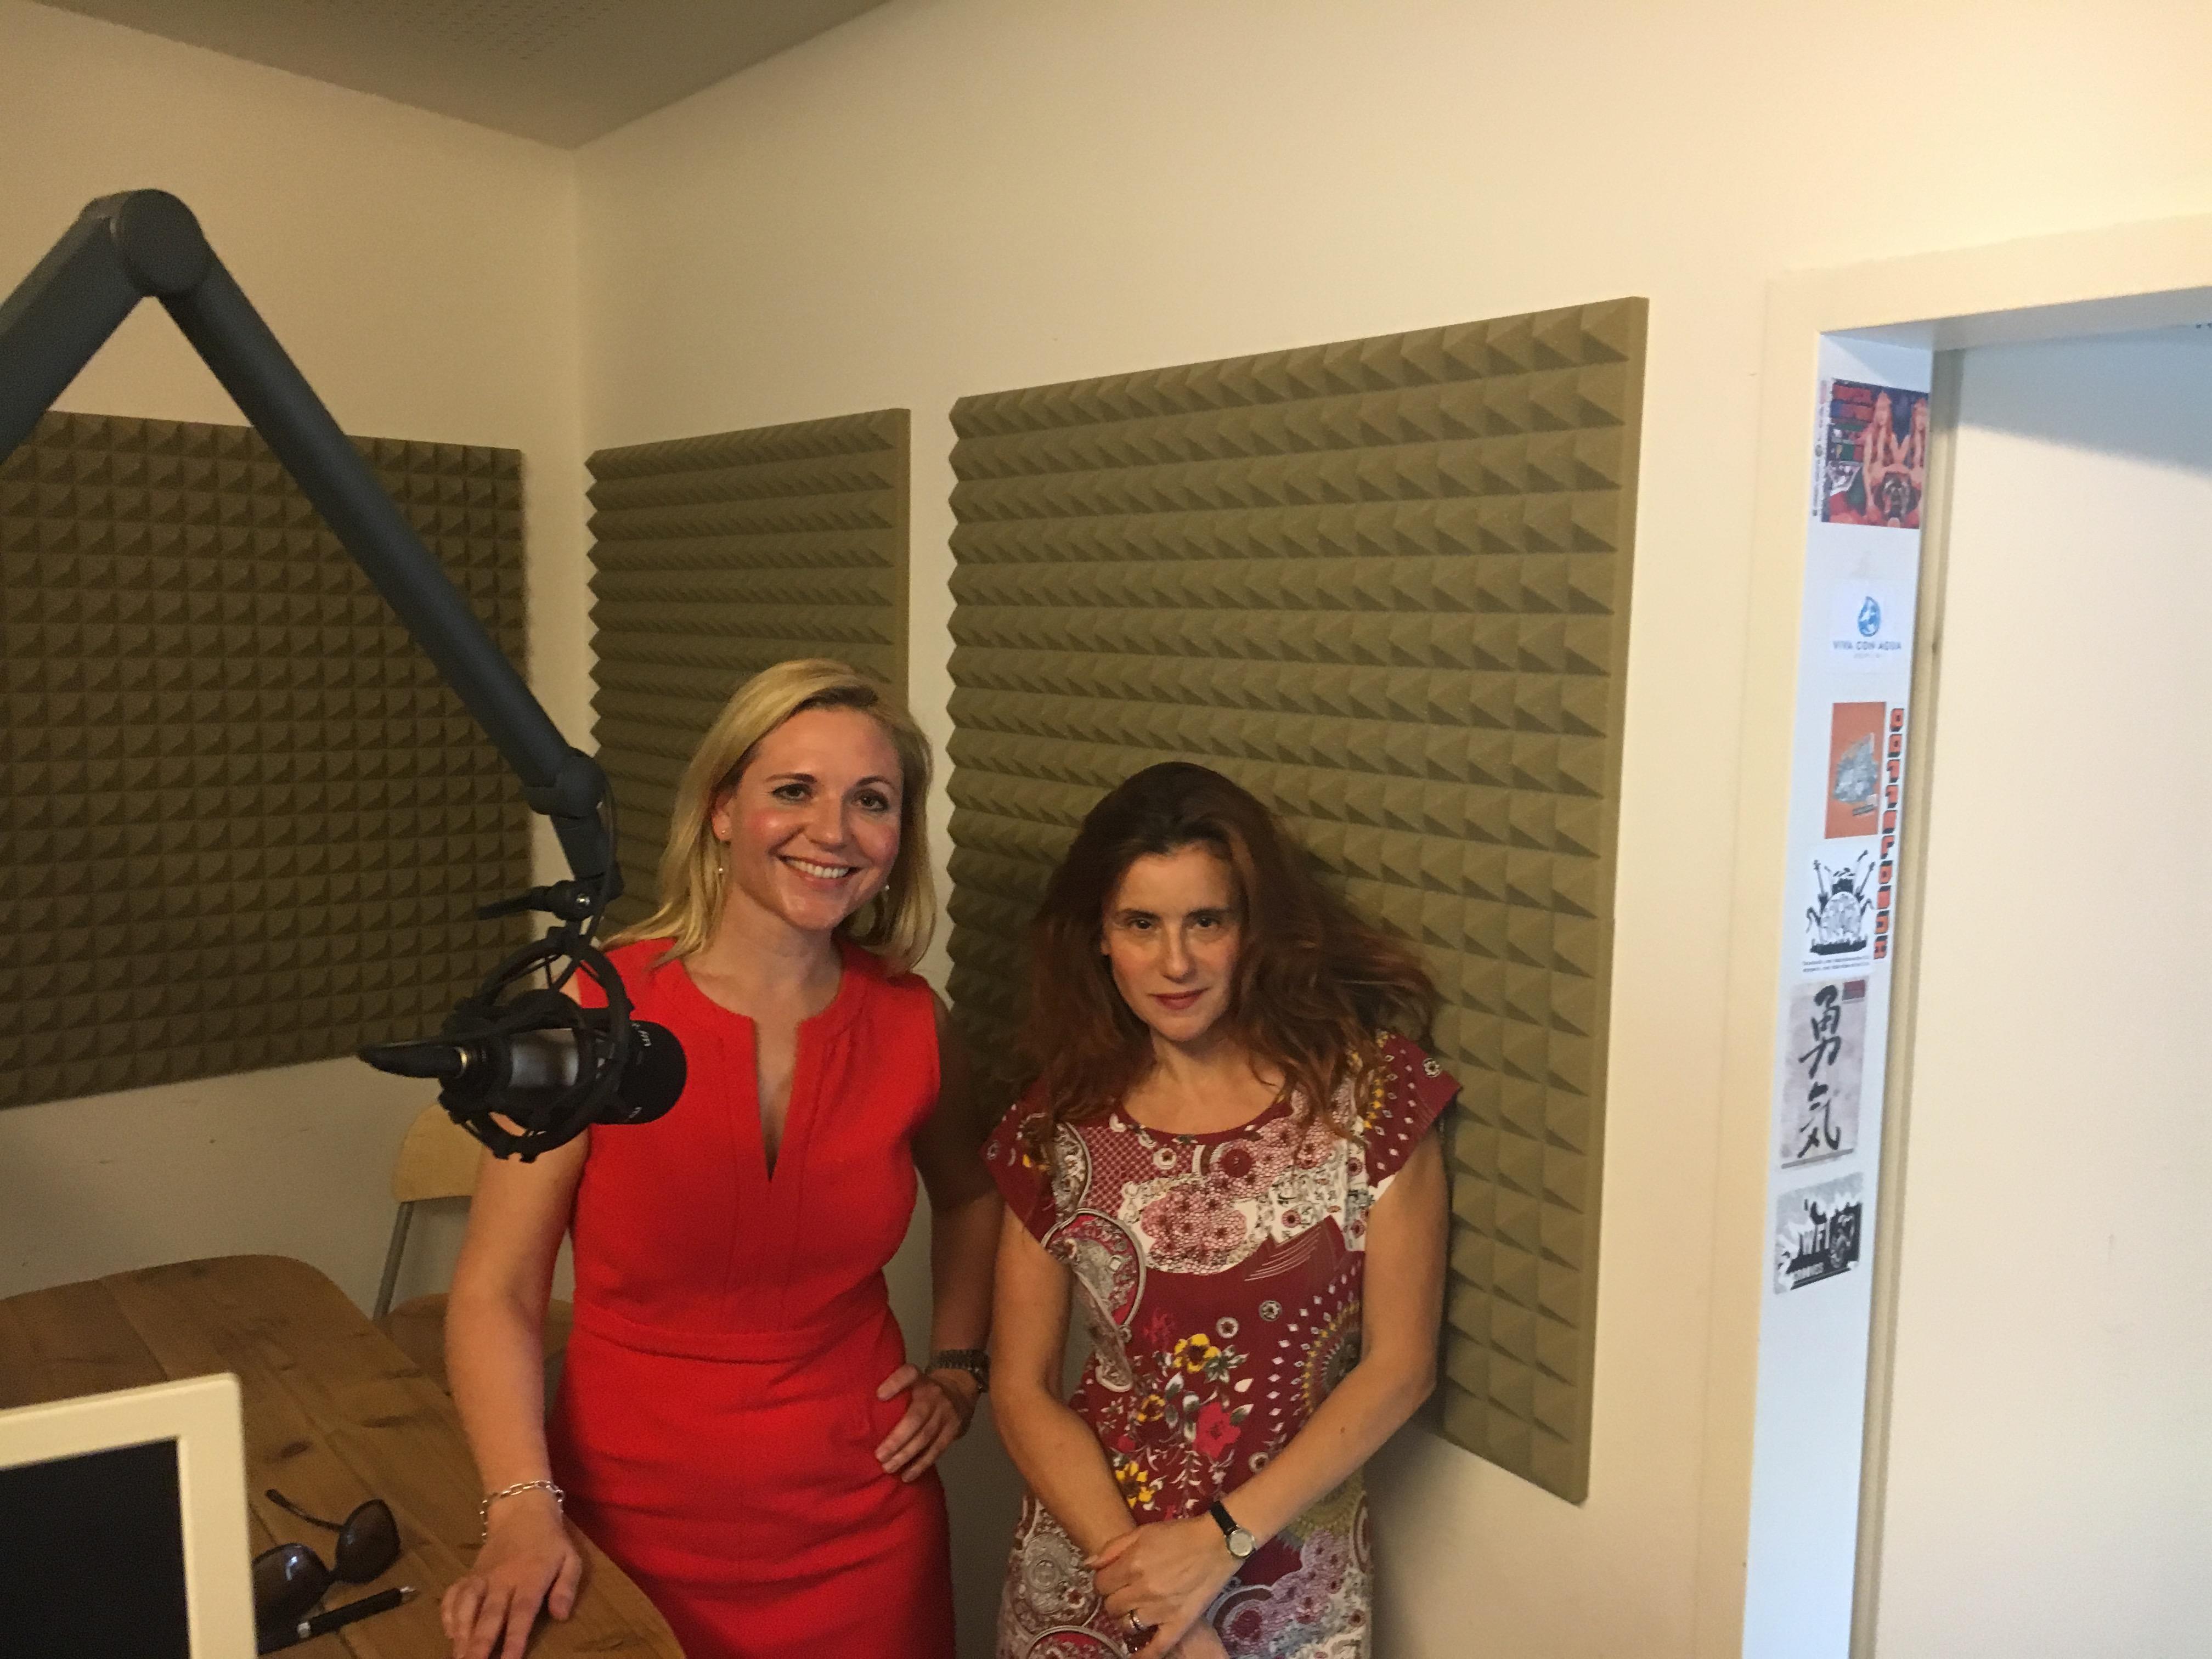 Presse: Sandra Pabst zu Gast bei Radio multicult.fm